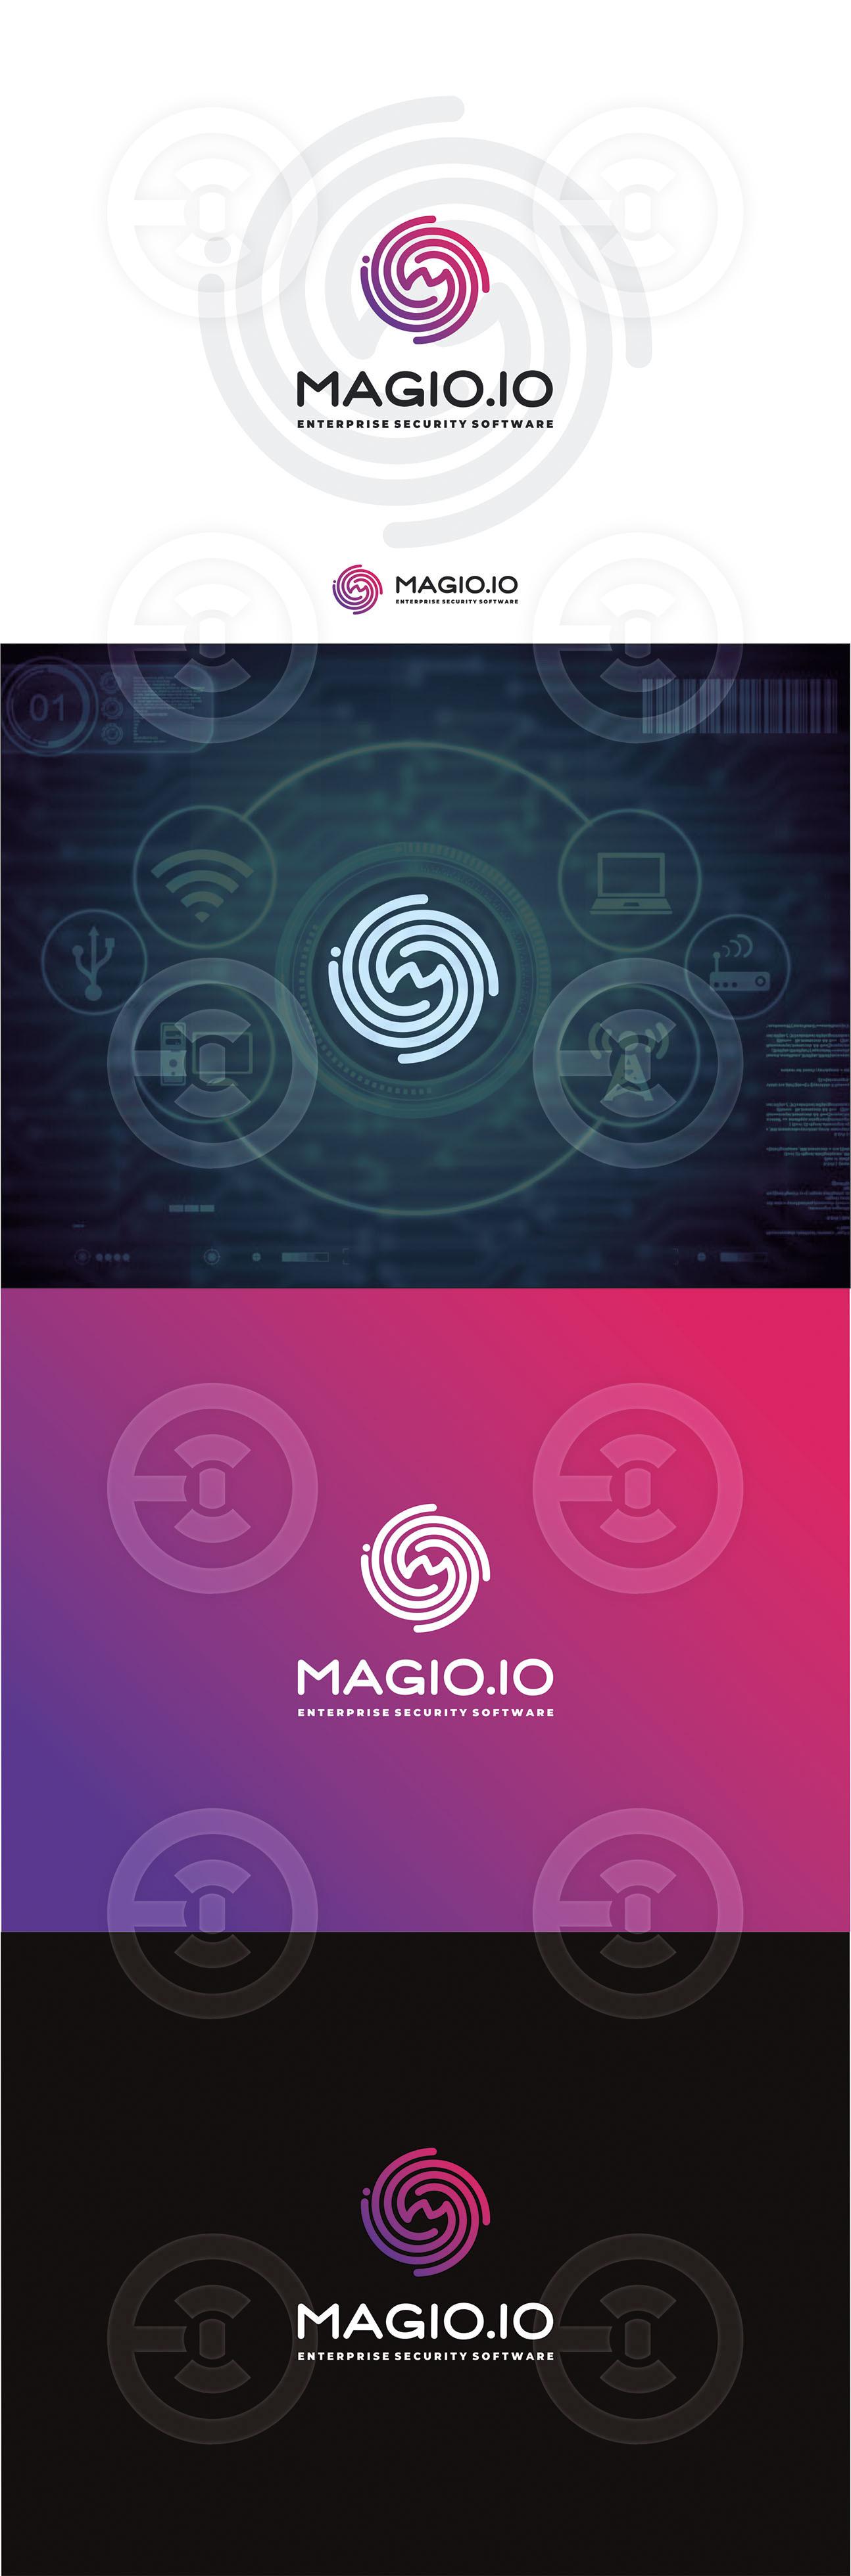 magio1.jpg